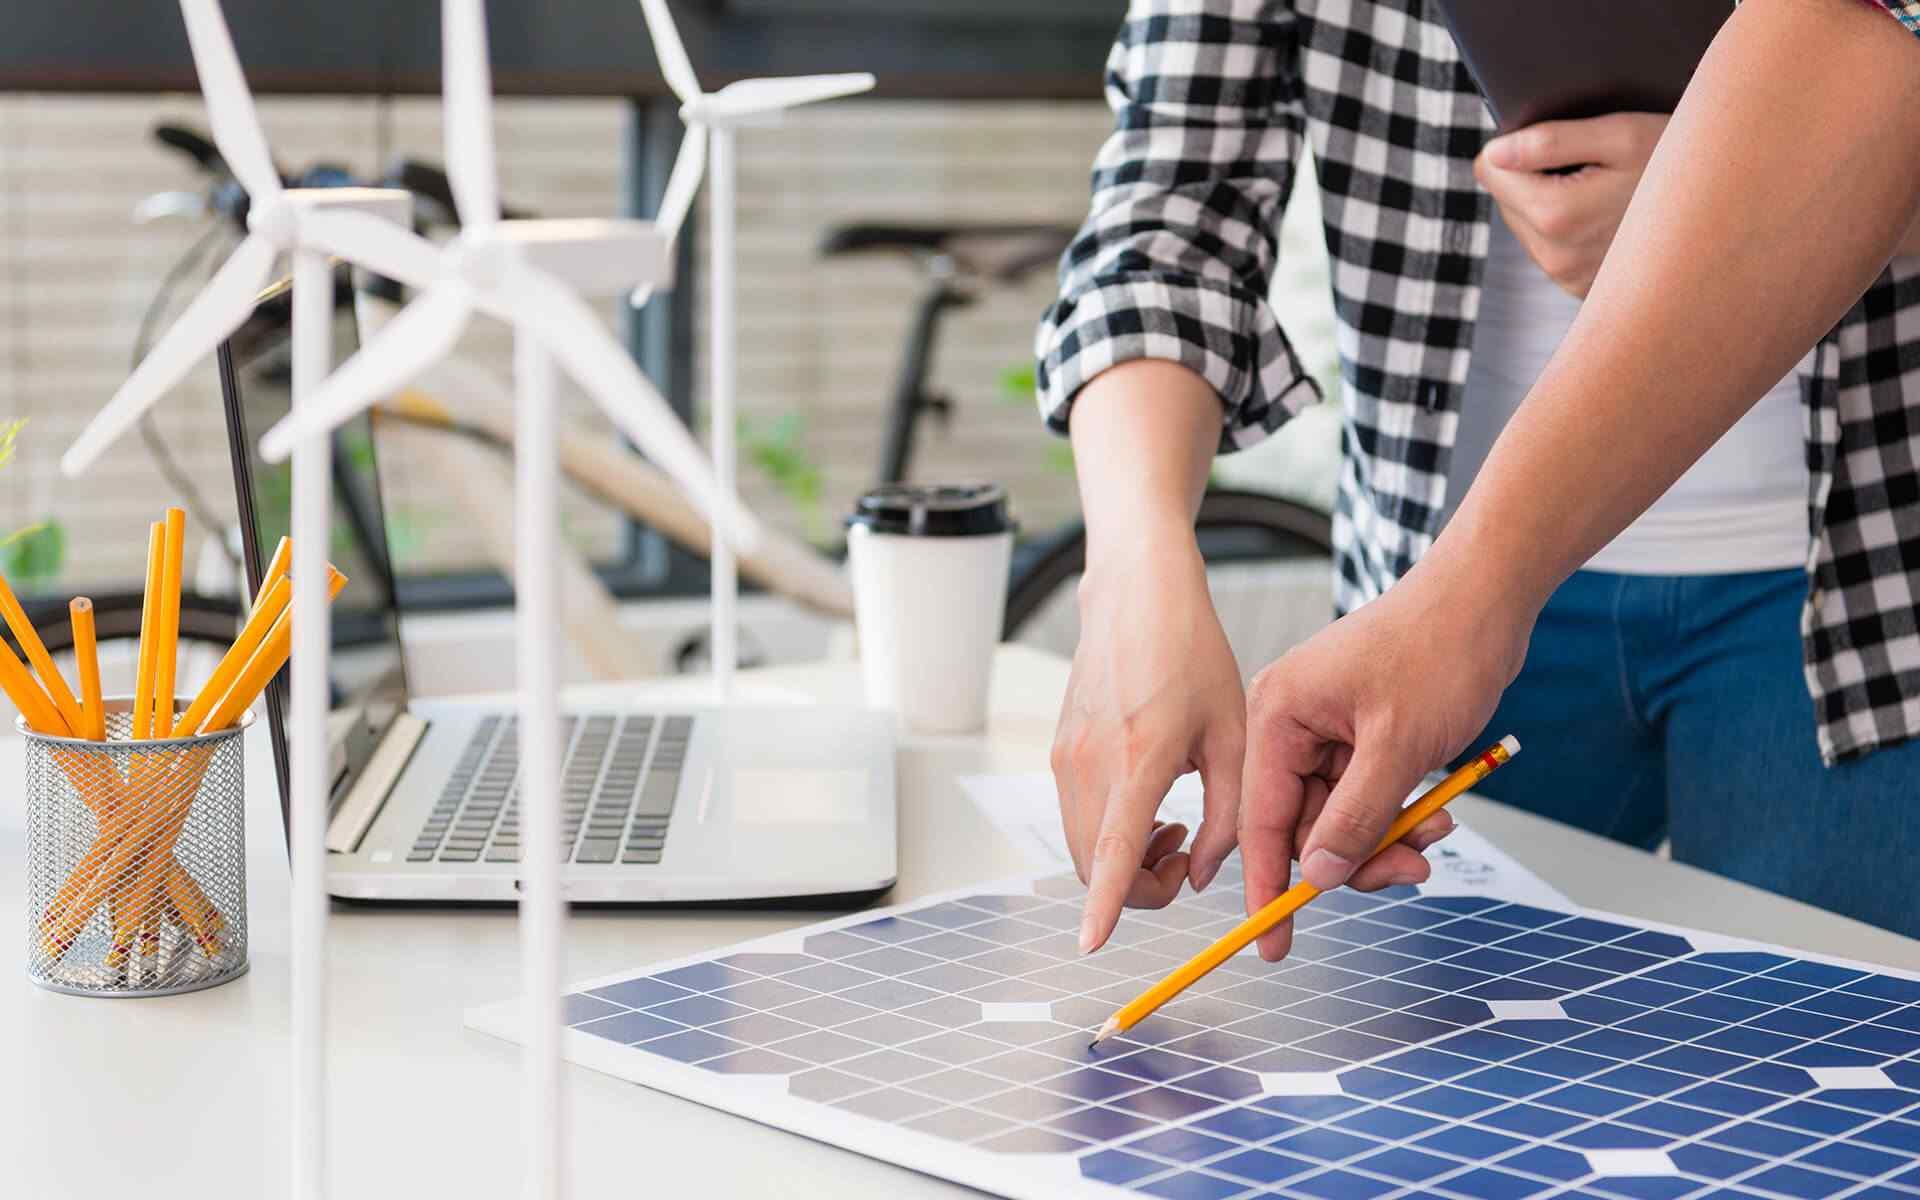 https://lasvegas-solarpanels.com/wp-content/uploads/2018/09/post_05.jpg